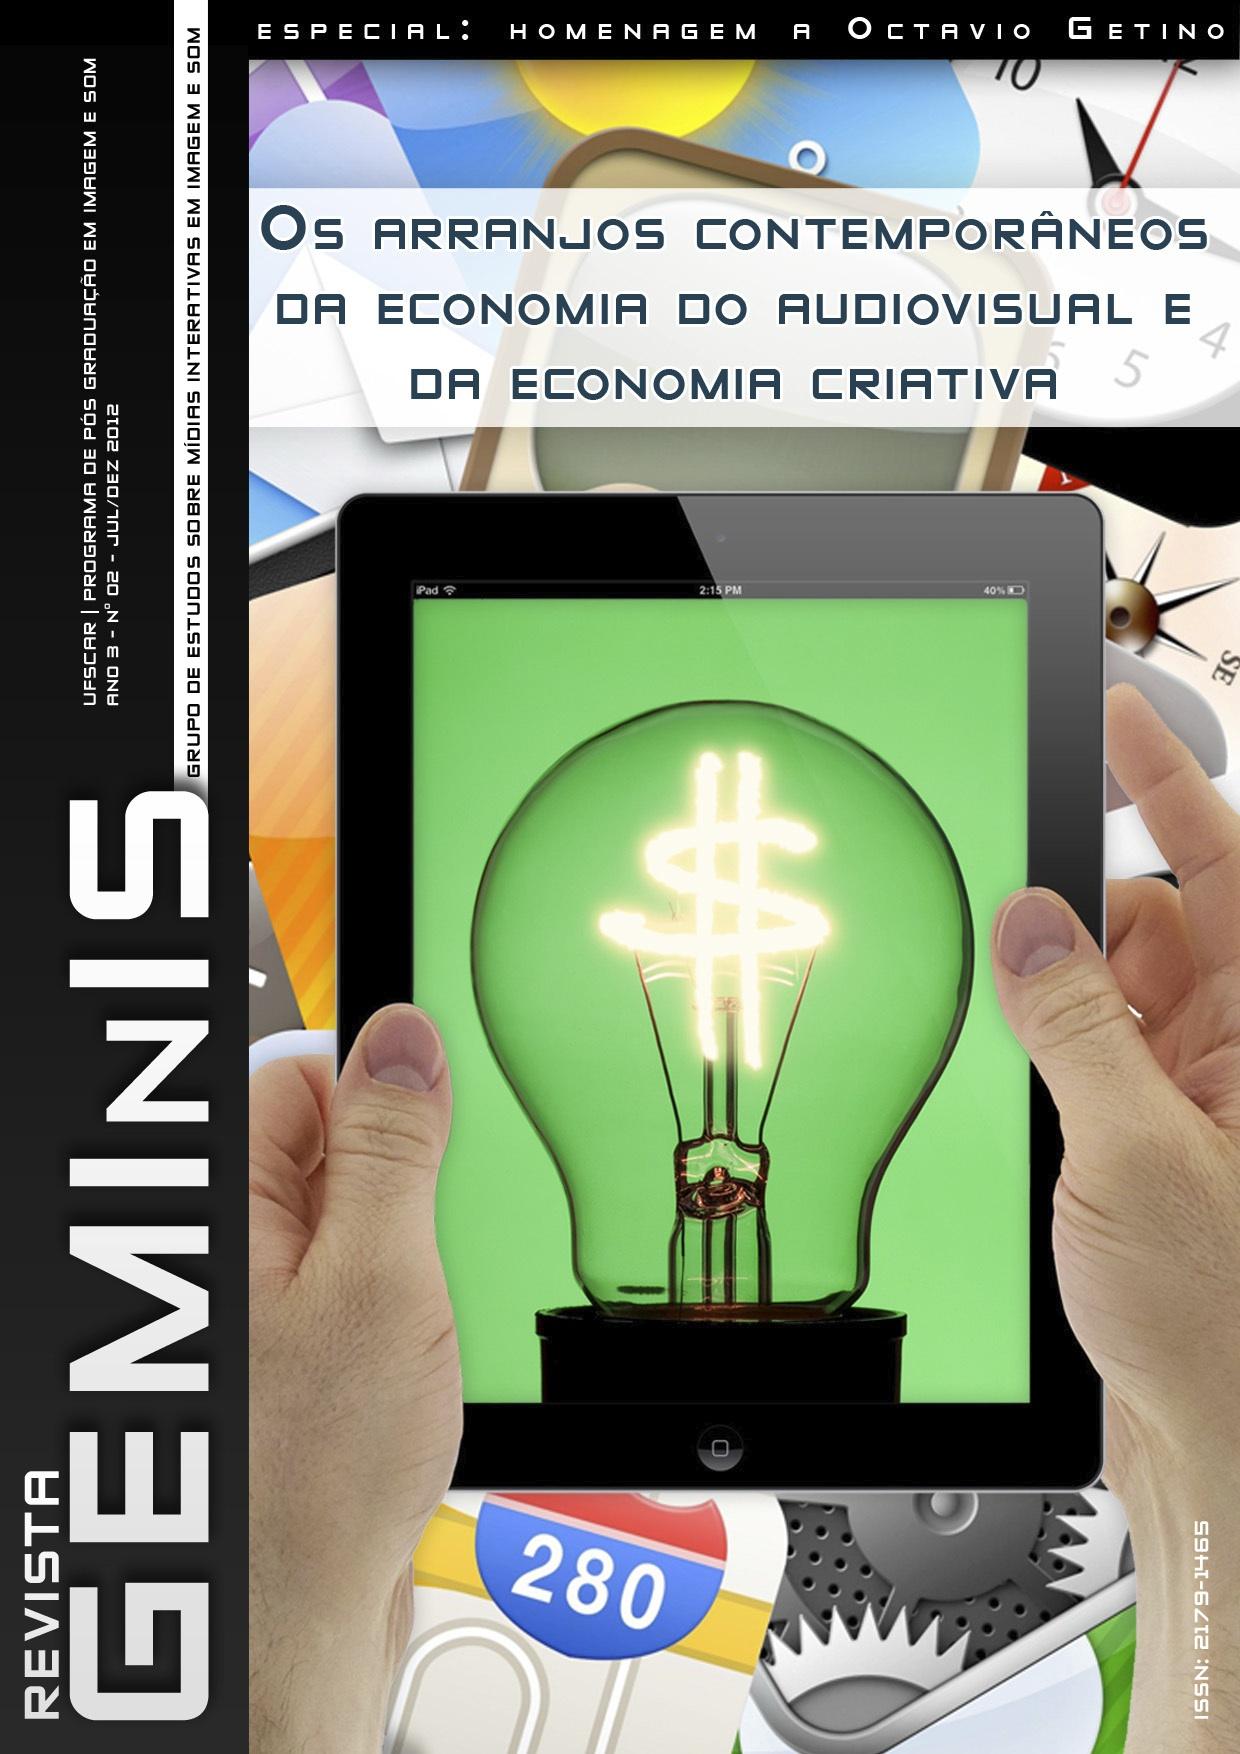 revista5_mercado_completo